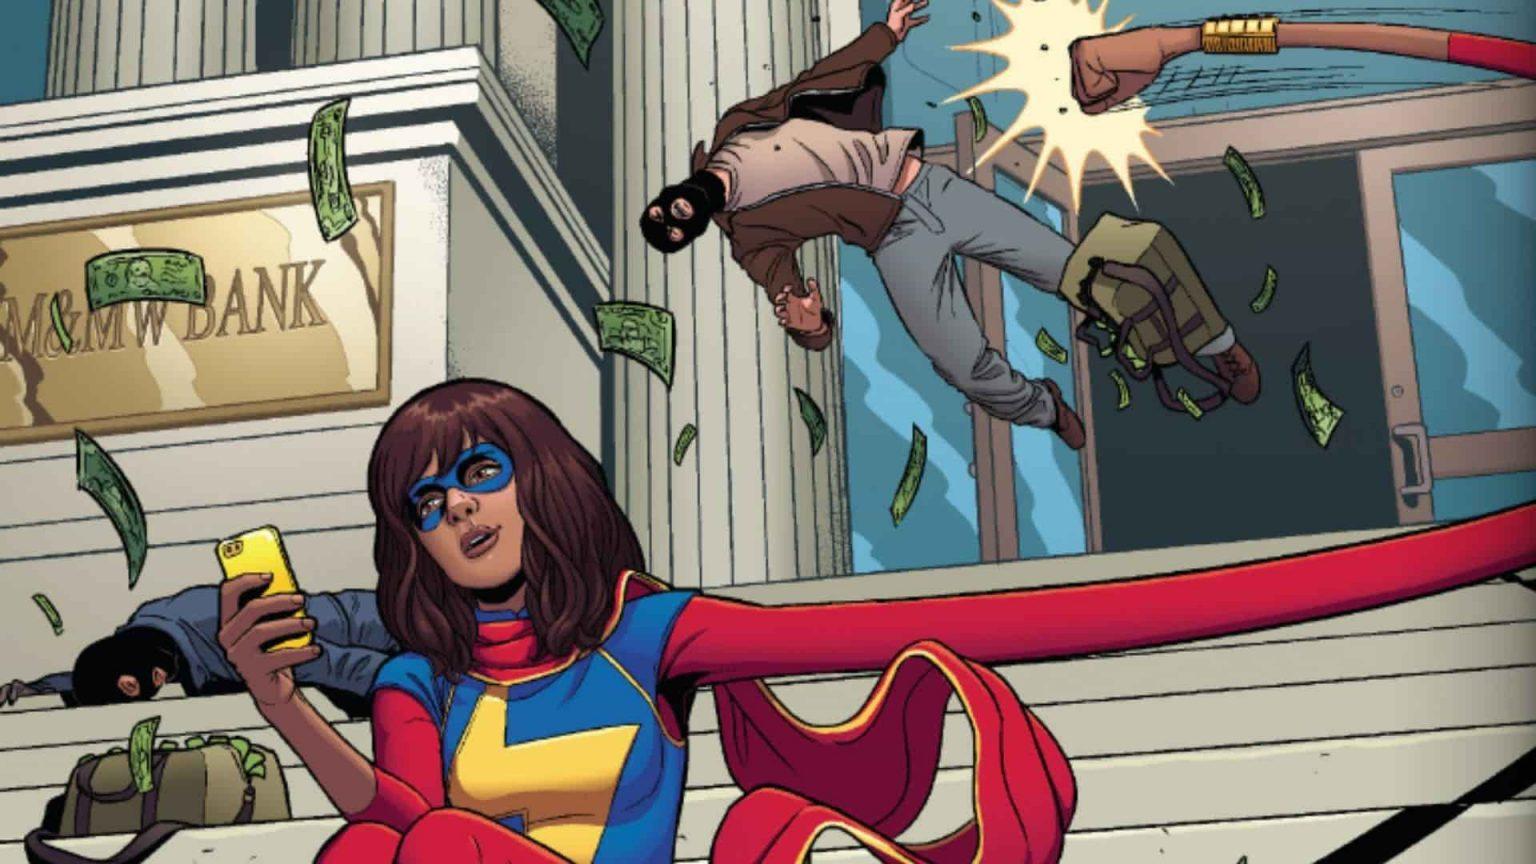 Ms.-Marvel-21-10-20-img01-1536x864